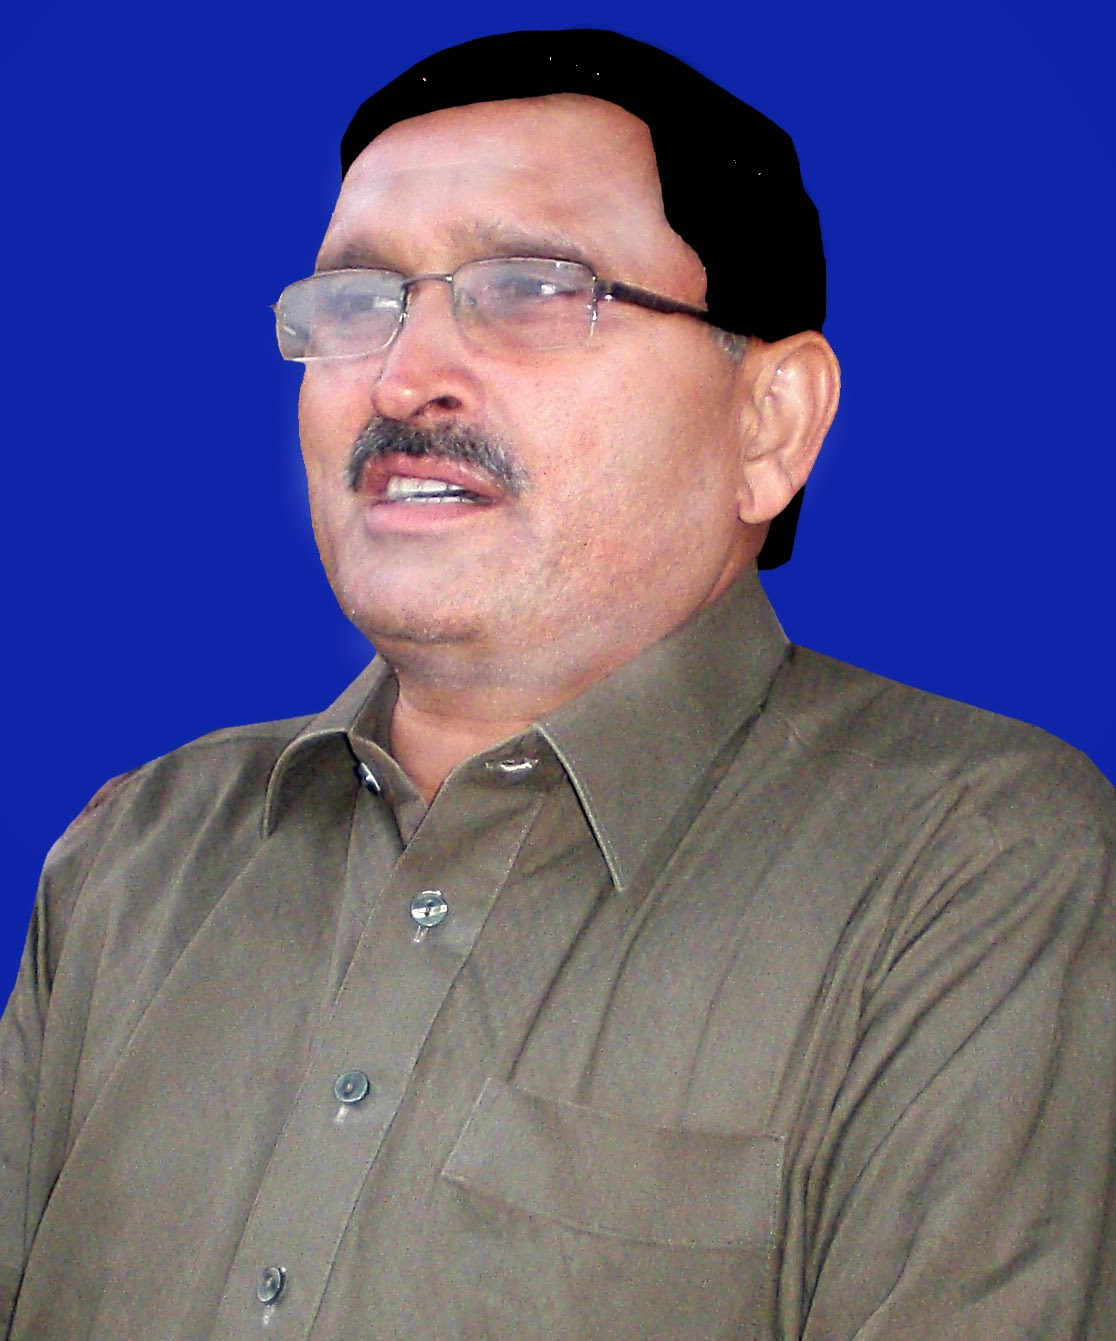 Search Results Mian Aslam Iqbal Pti .html